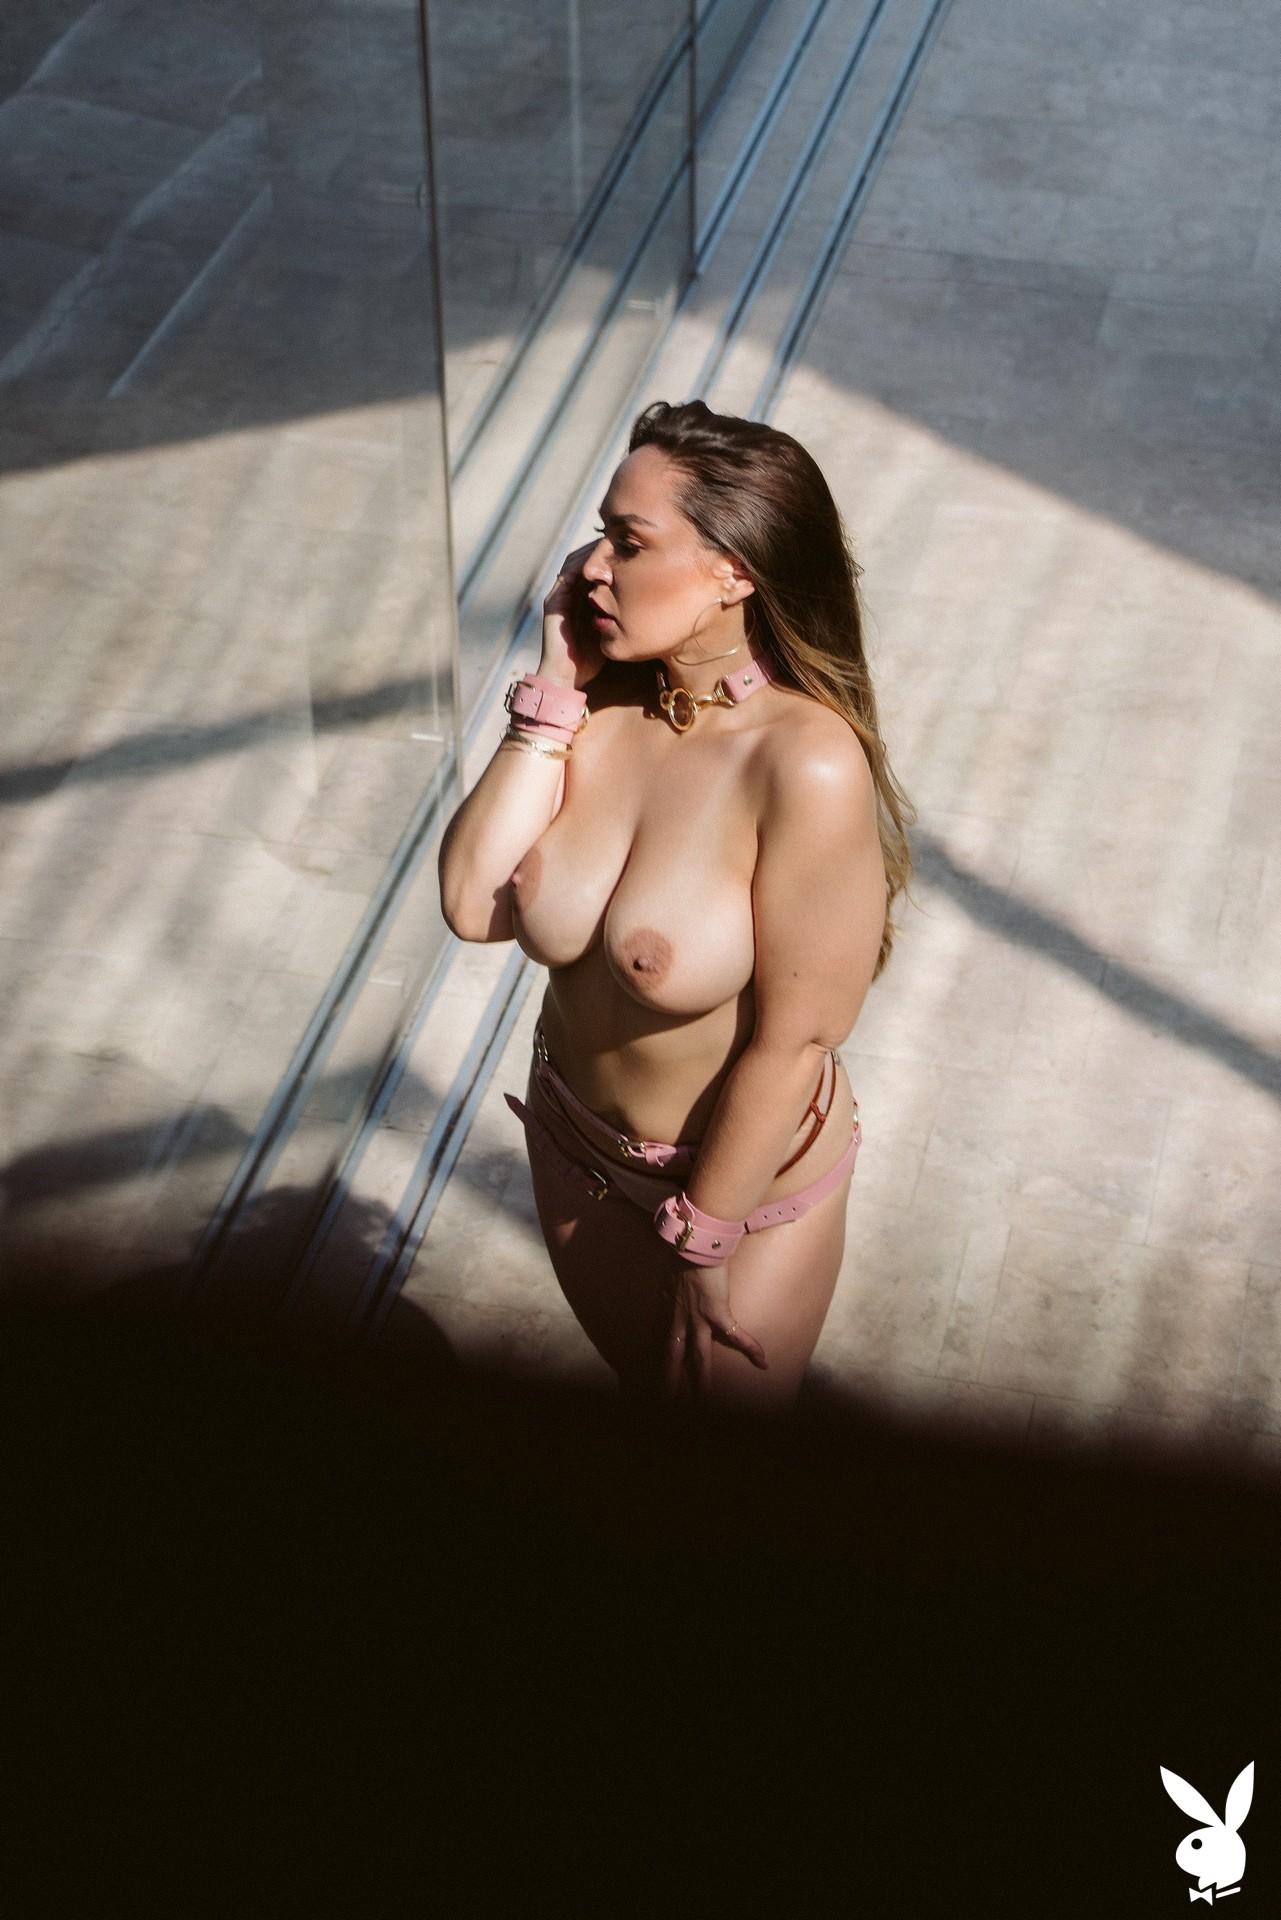 Sophia Grey In Different View Playboy Plus (5)